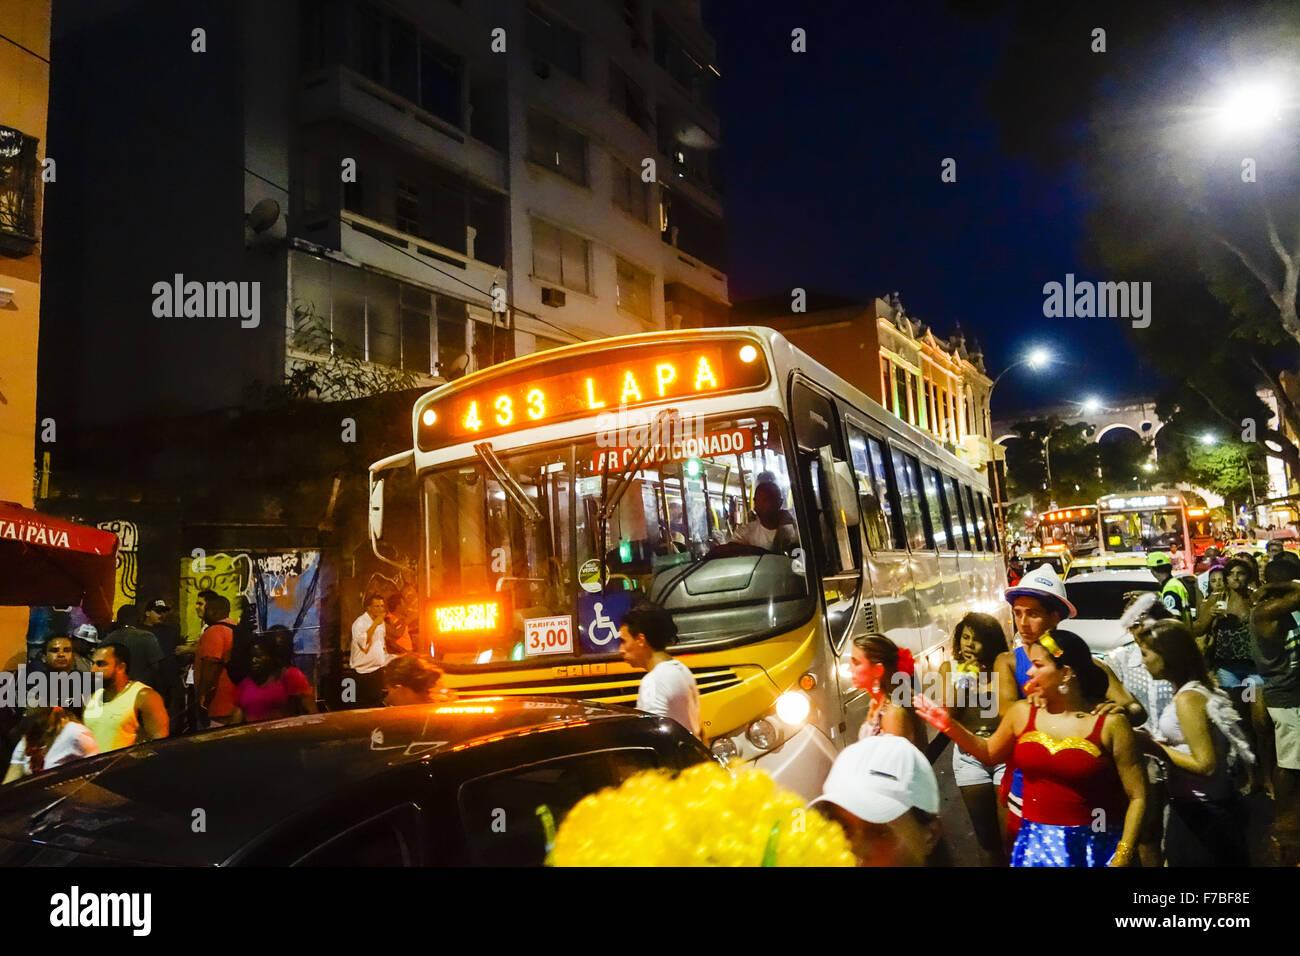 Straßenkarneval Lapa, Rio De Janeiro, Brasilien Stockbild